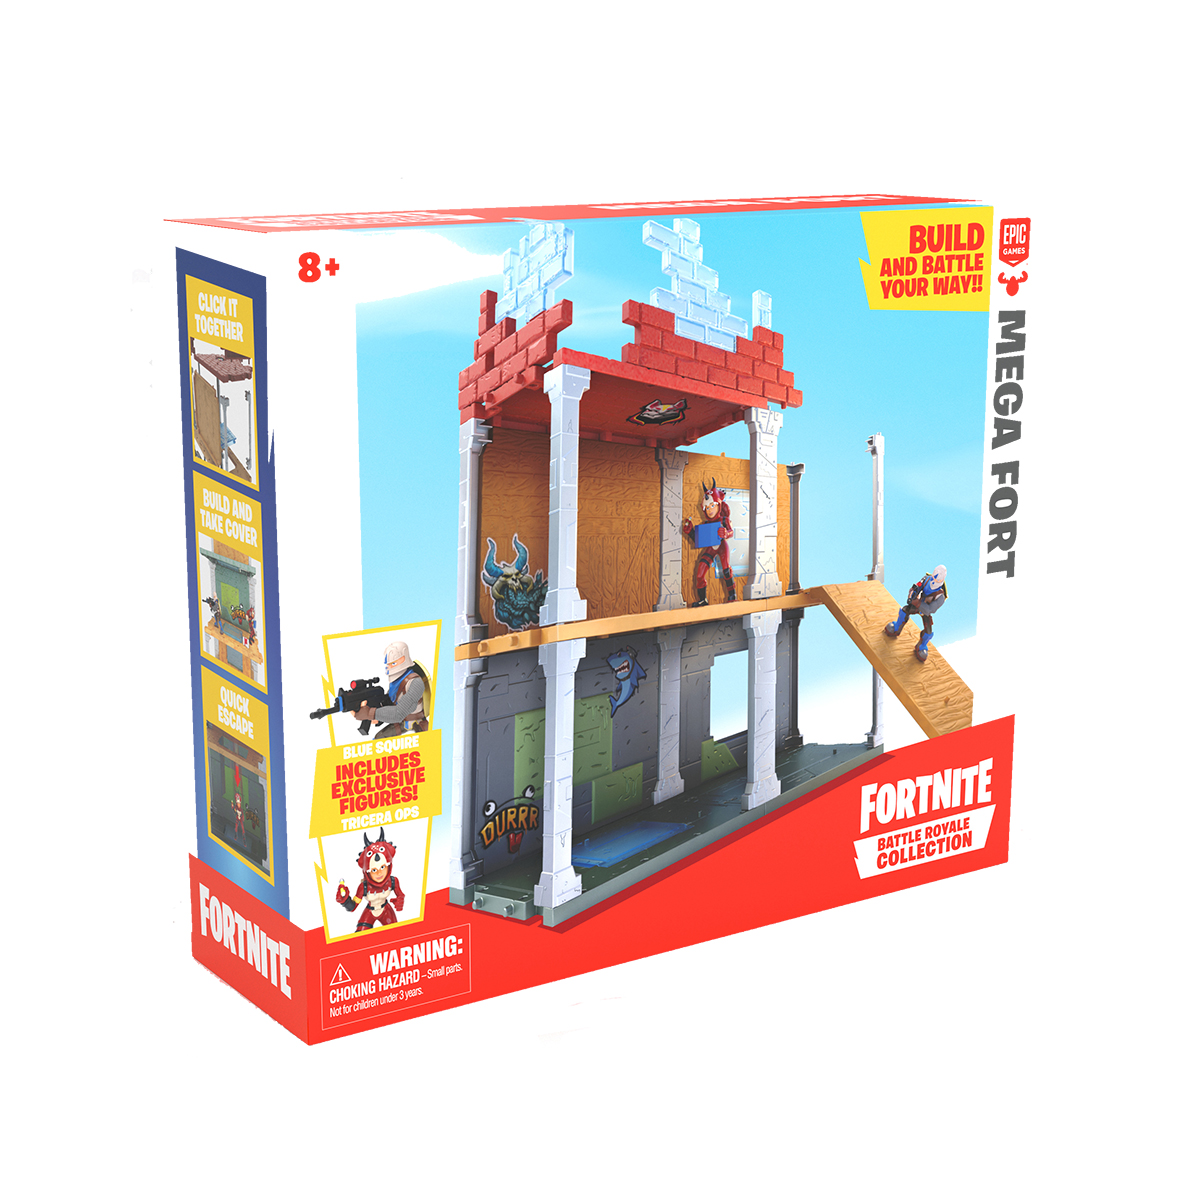 Set de joaca cu 2 figurine Fortnite Battle Royale, Mega Fort